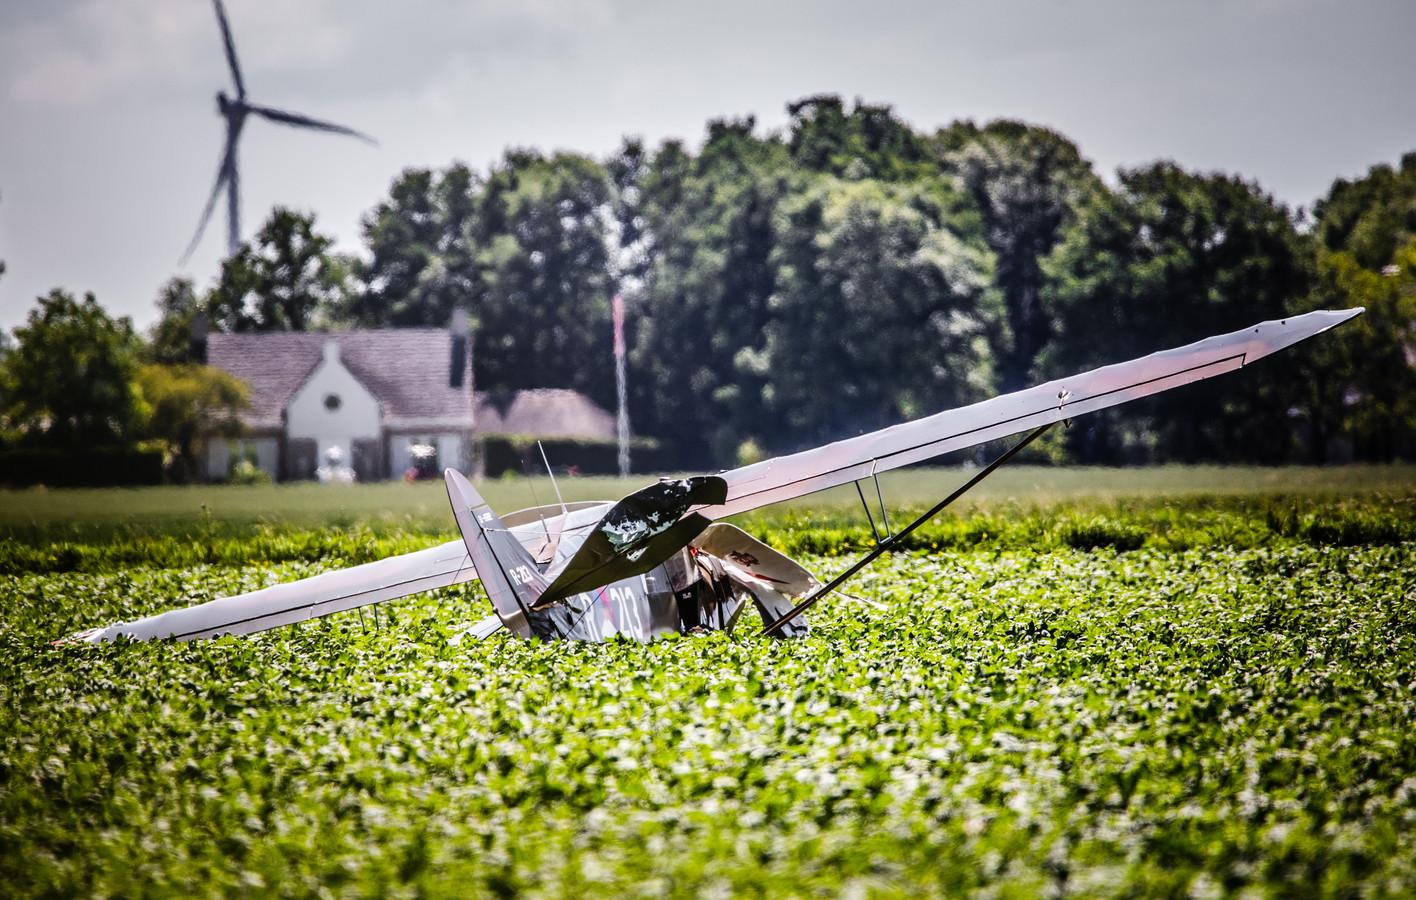 Vliegtuigcrash Willemstad botsing met twee sportvliegtuigen